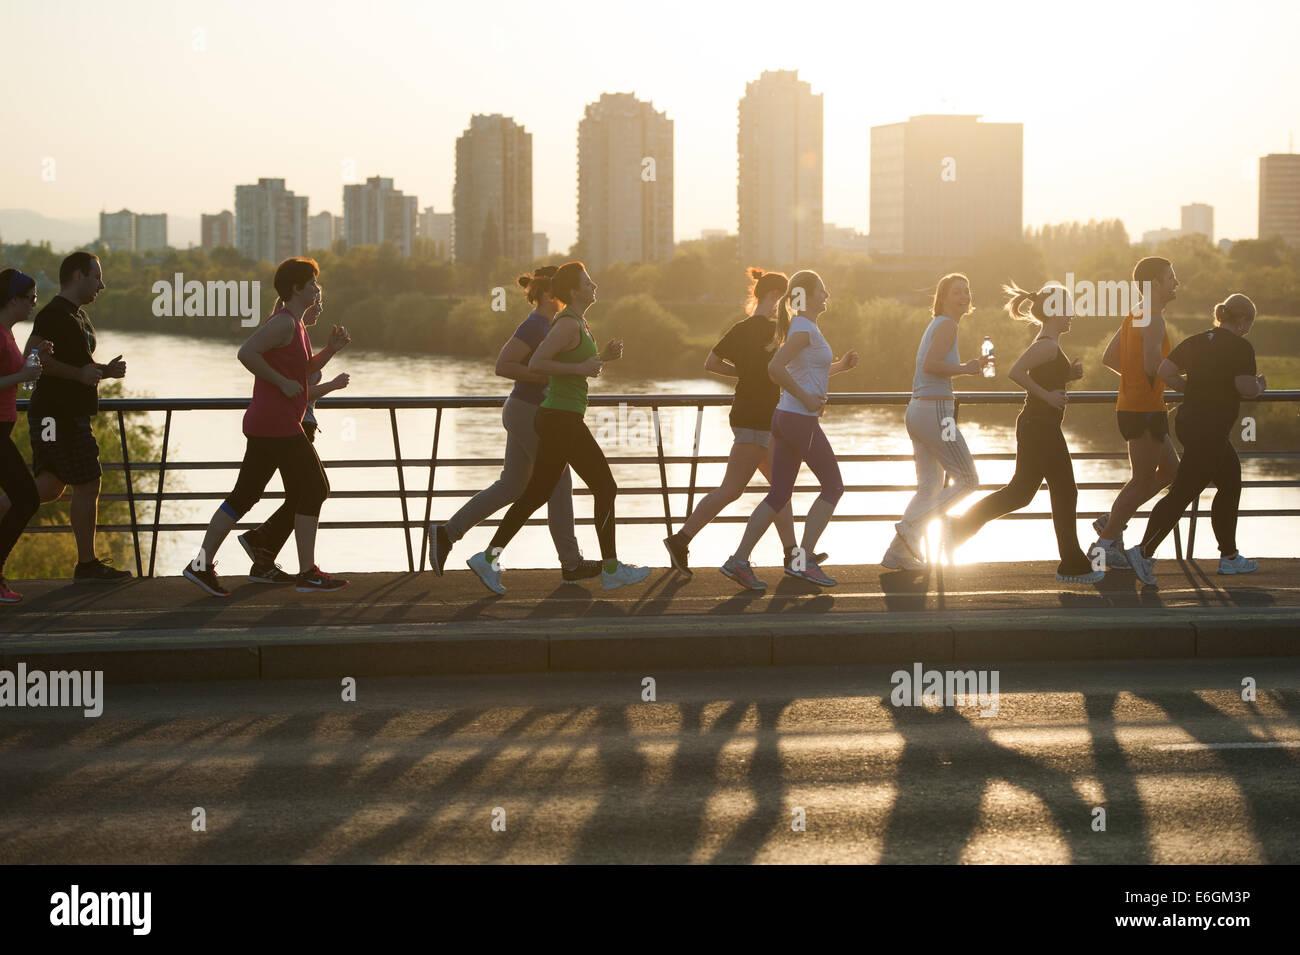 Running across the river Sava in Zagreb - Stock Image